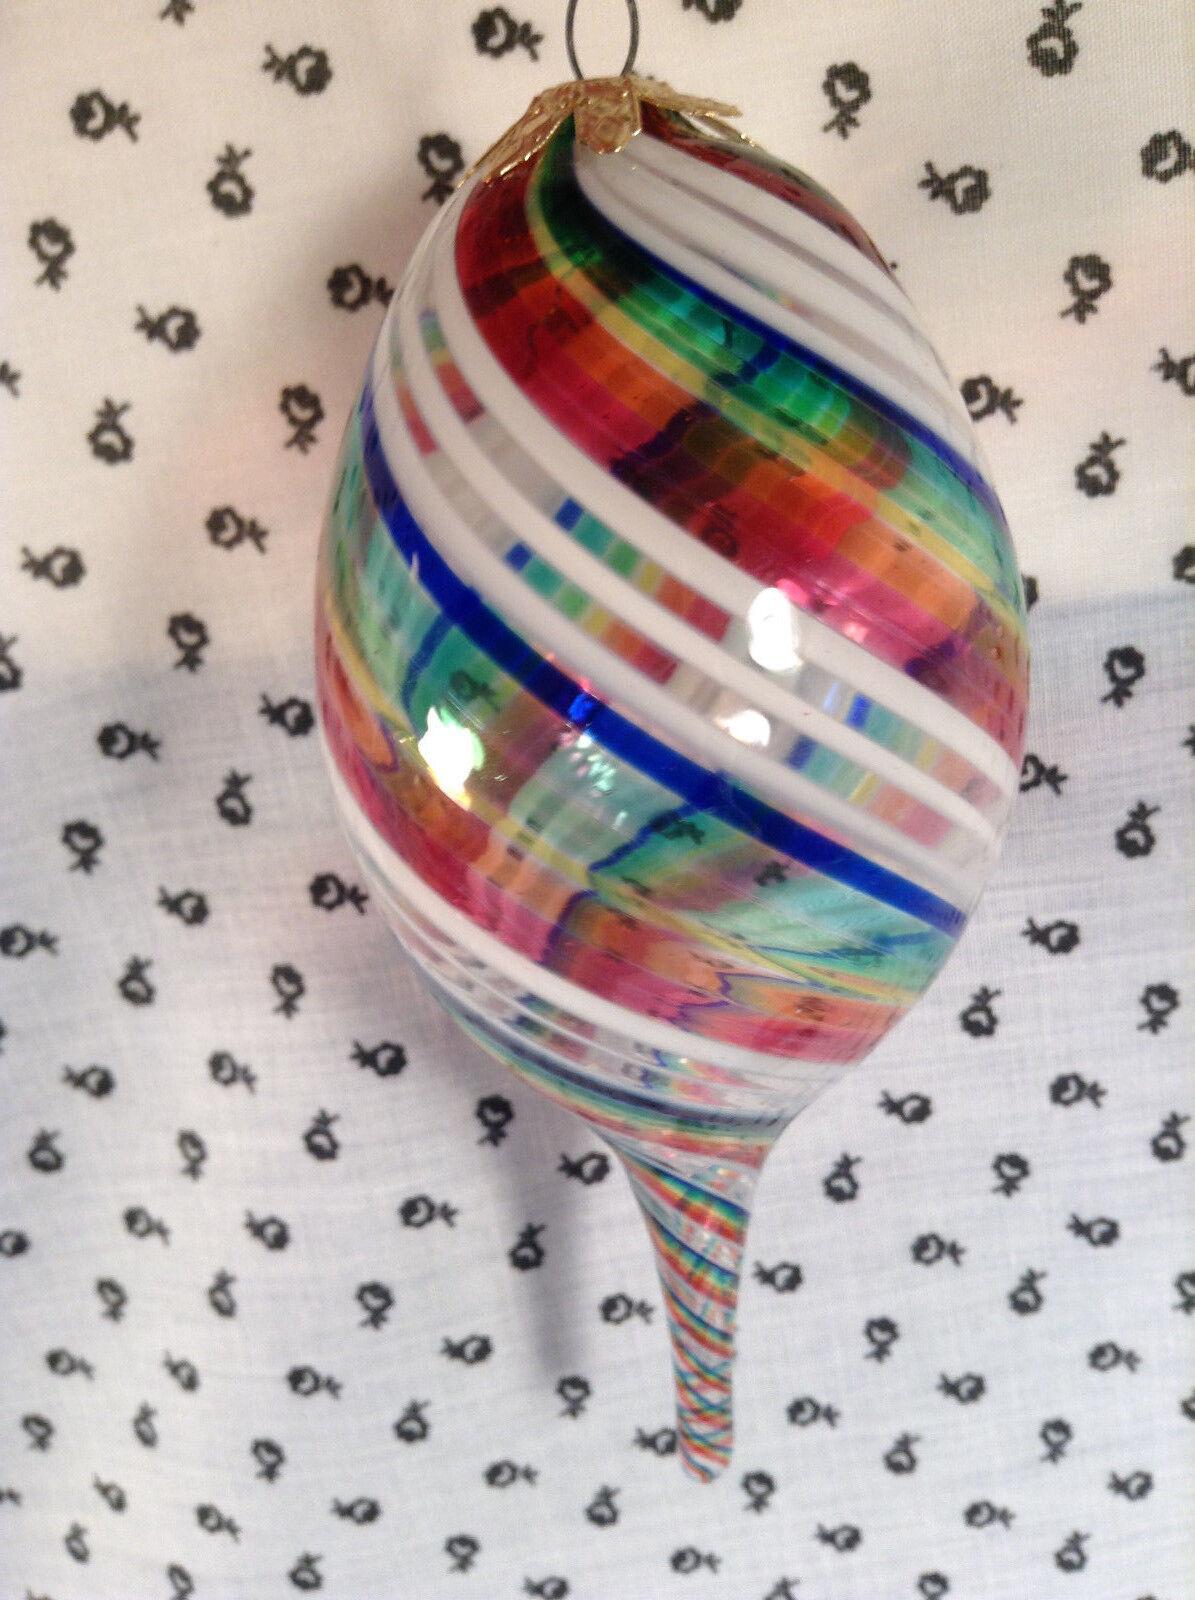 8 8 8 Piece Christmas Hand Blown Swirl Large Glass Bubbles Ornament Set  BEST OFFER f5e630